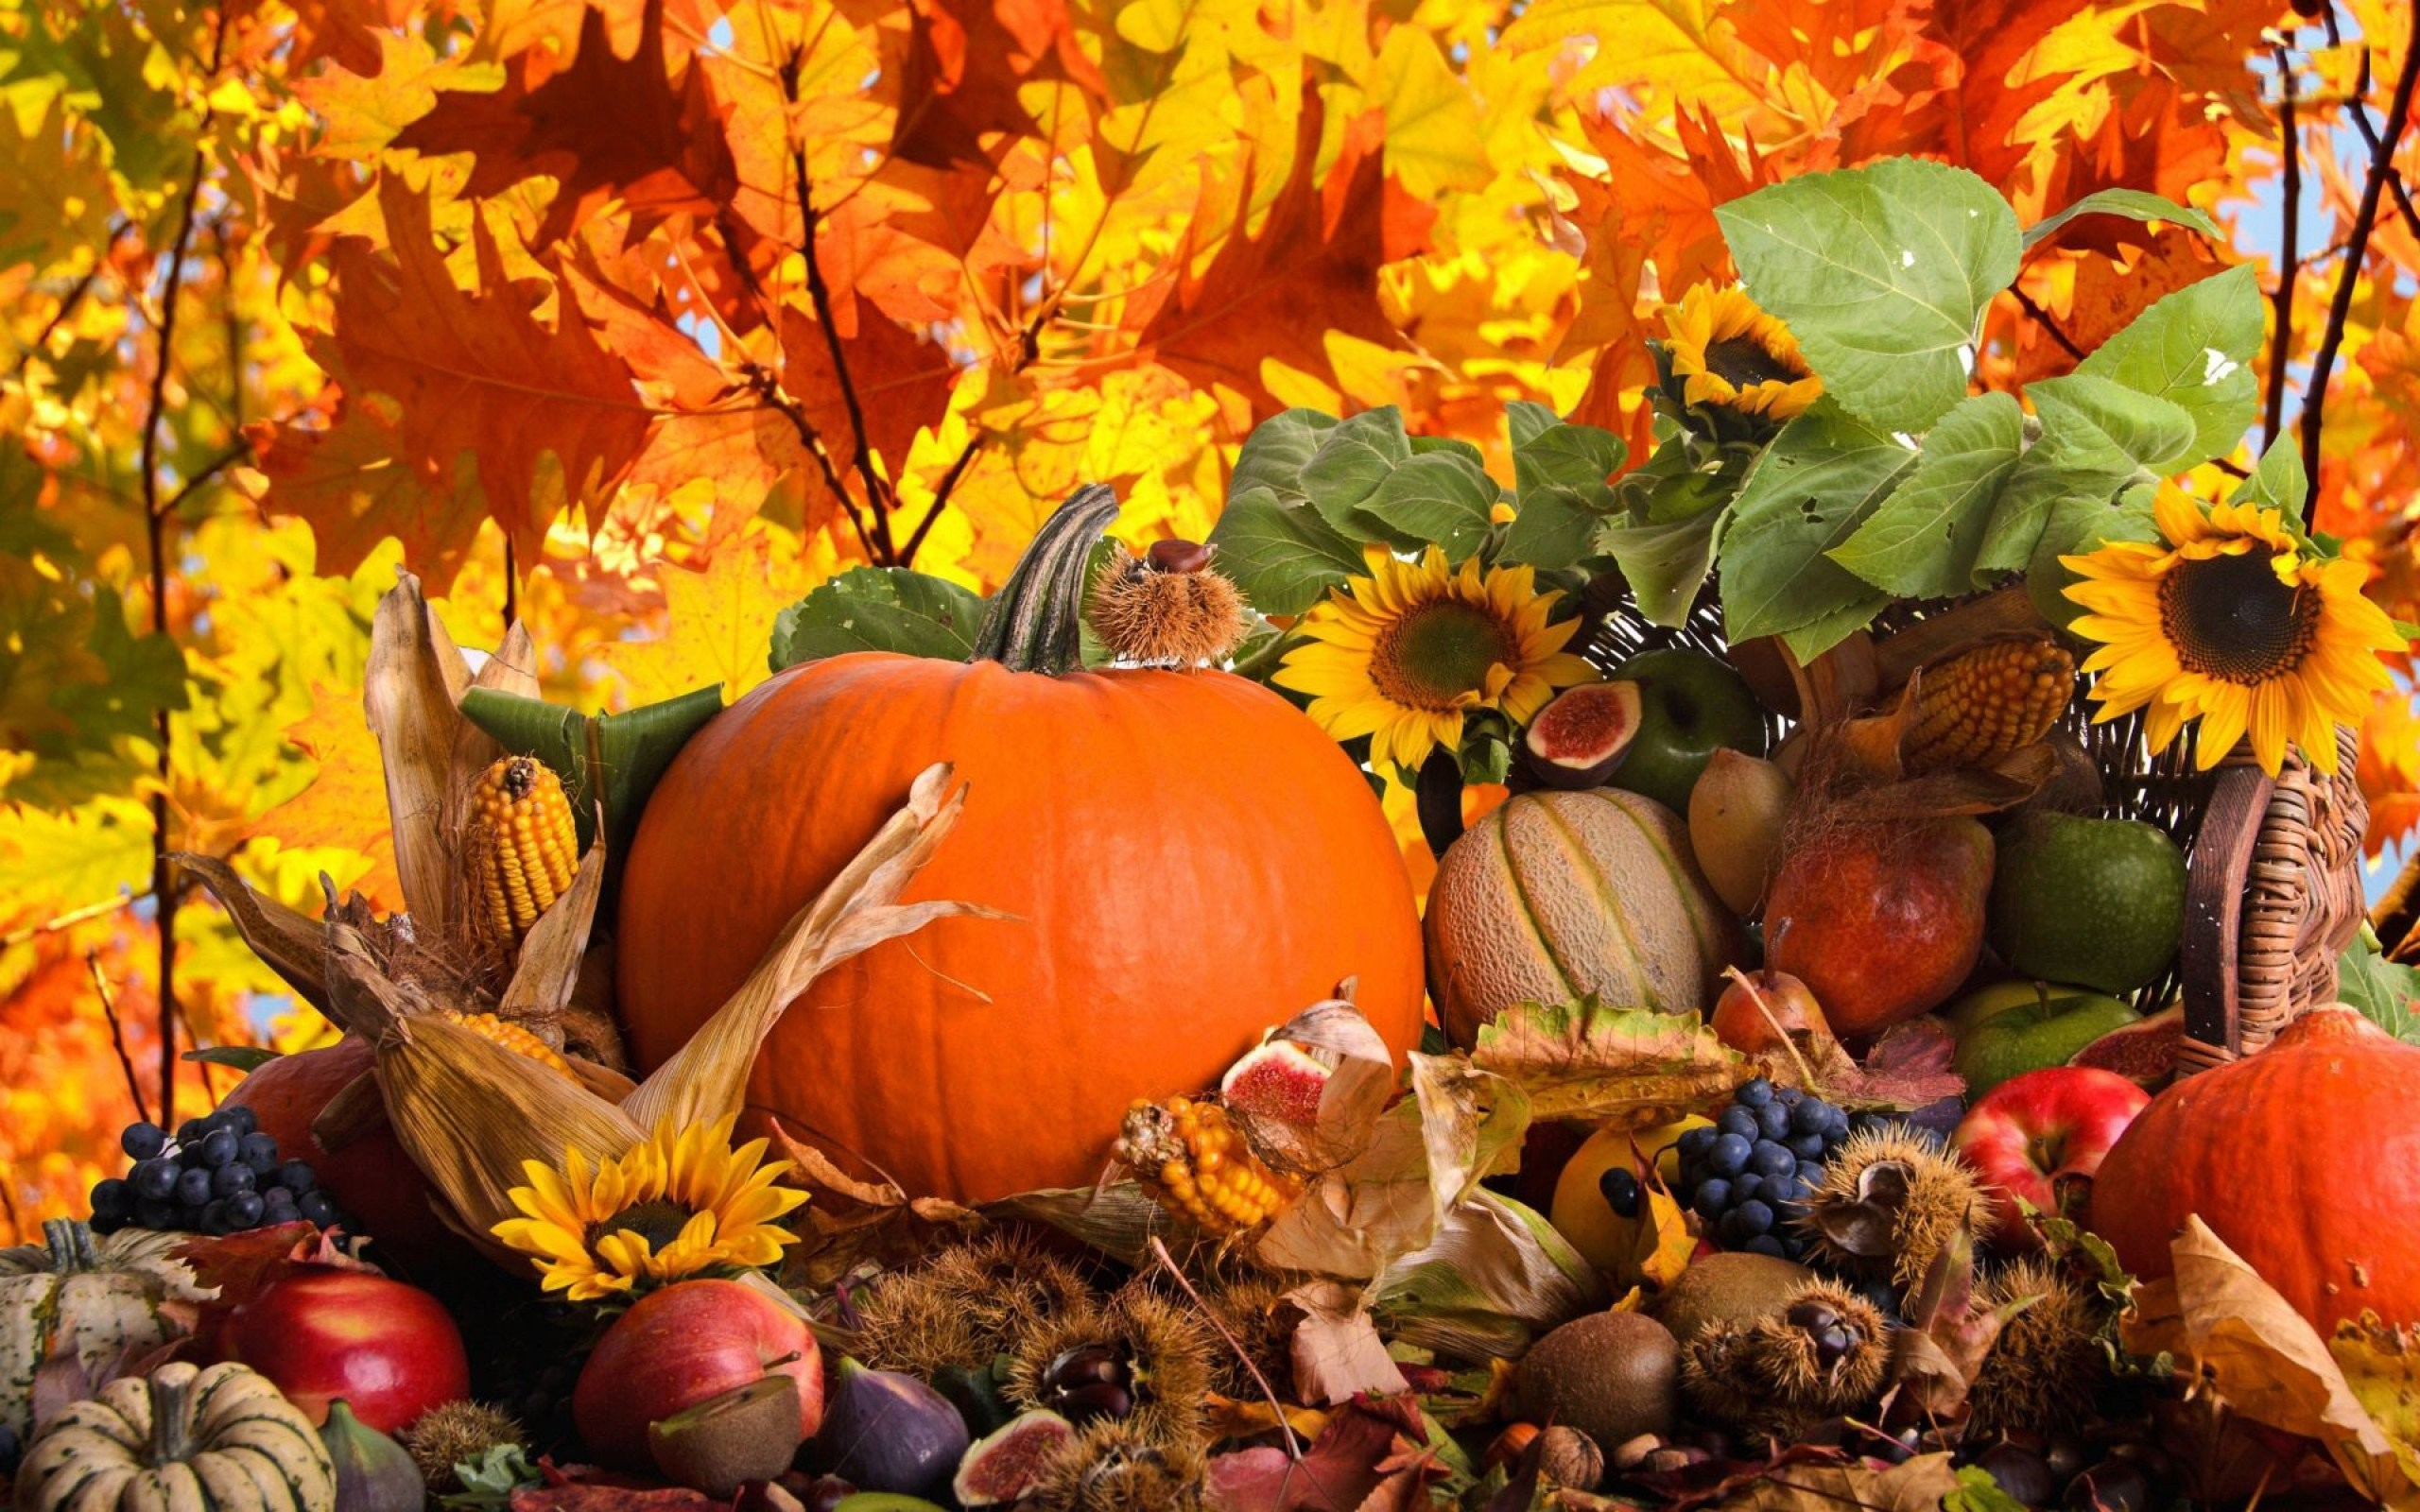 Thanksgiving Wallpaper Photo